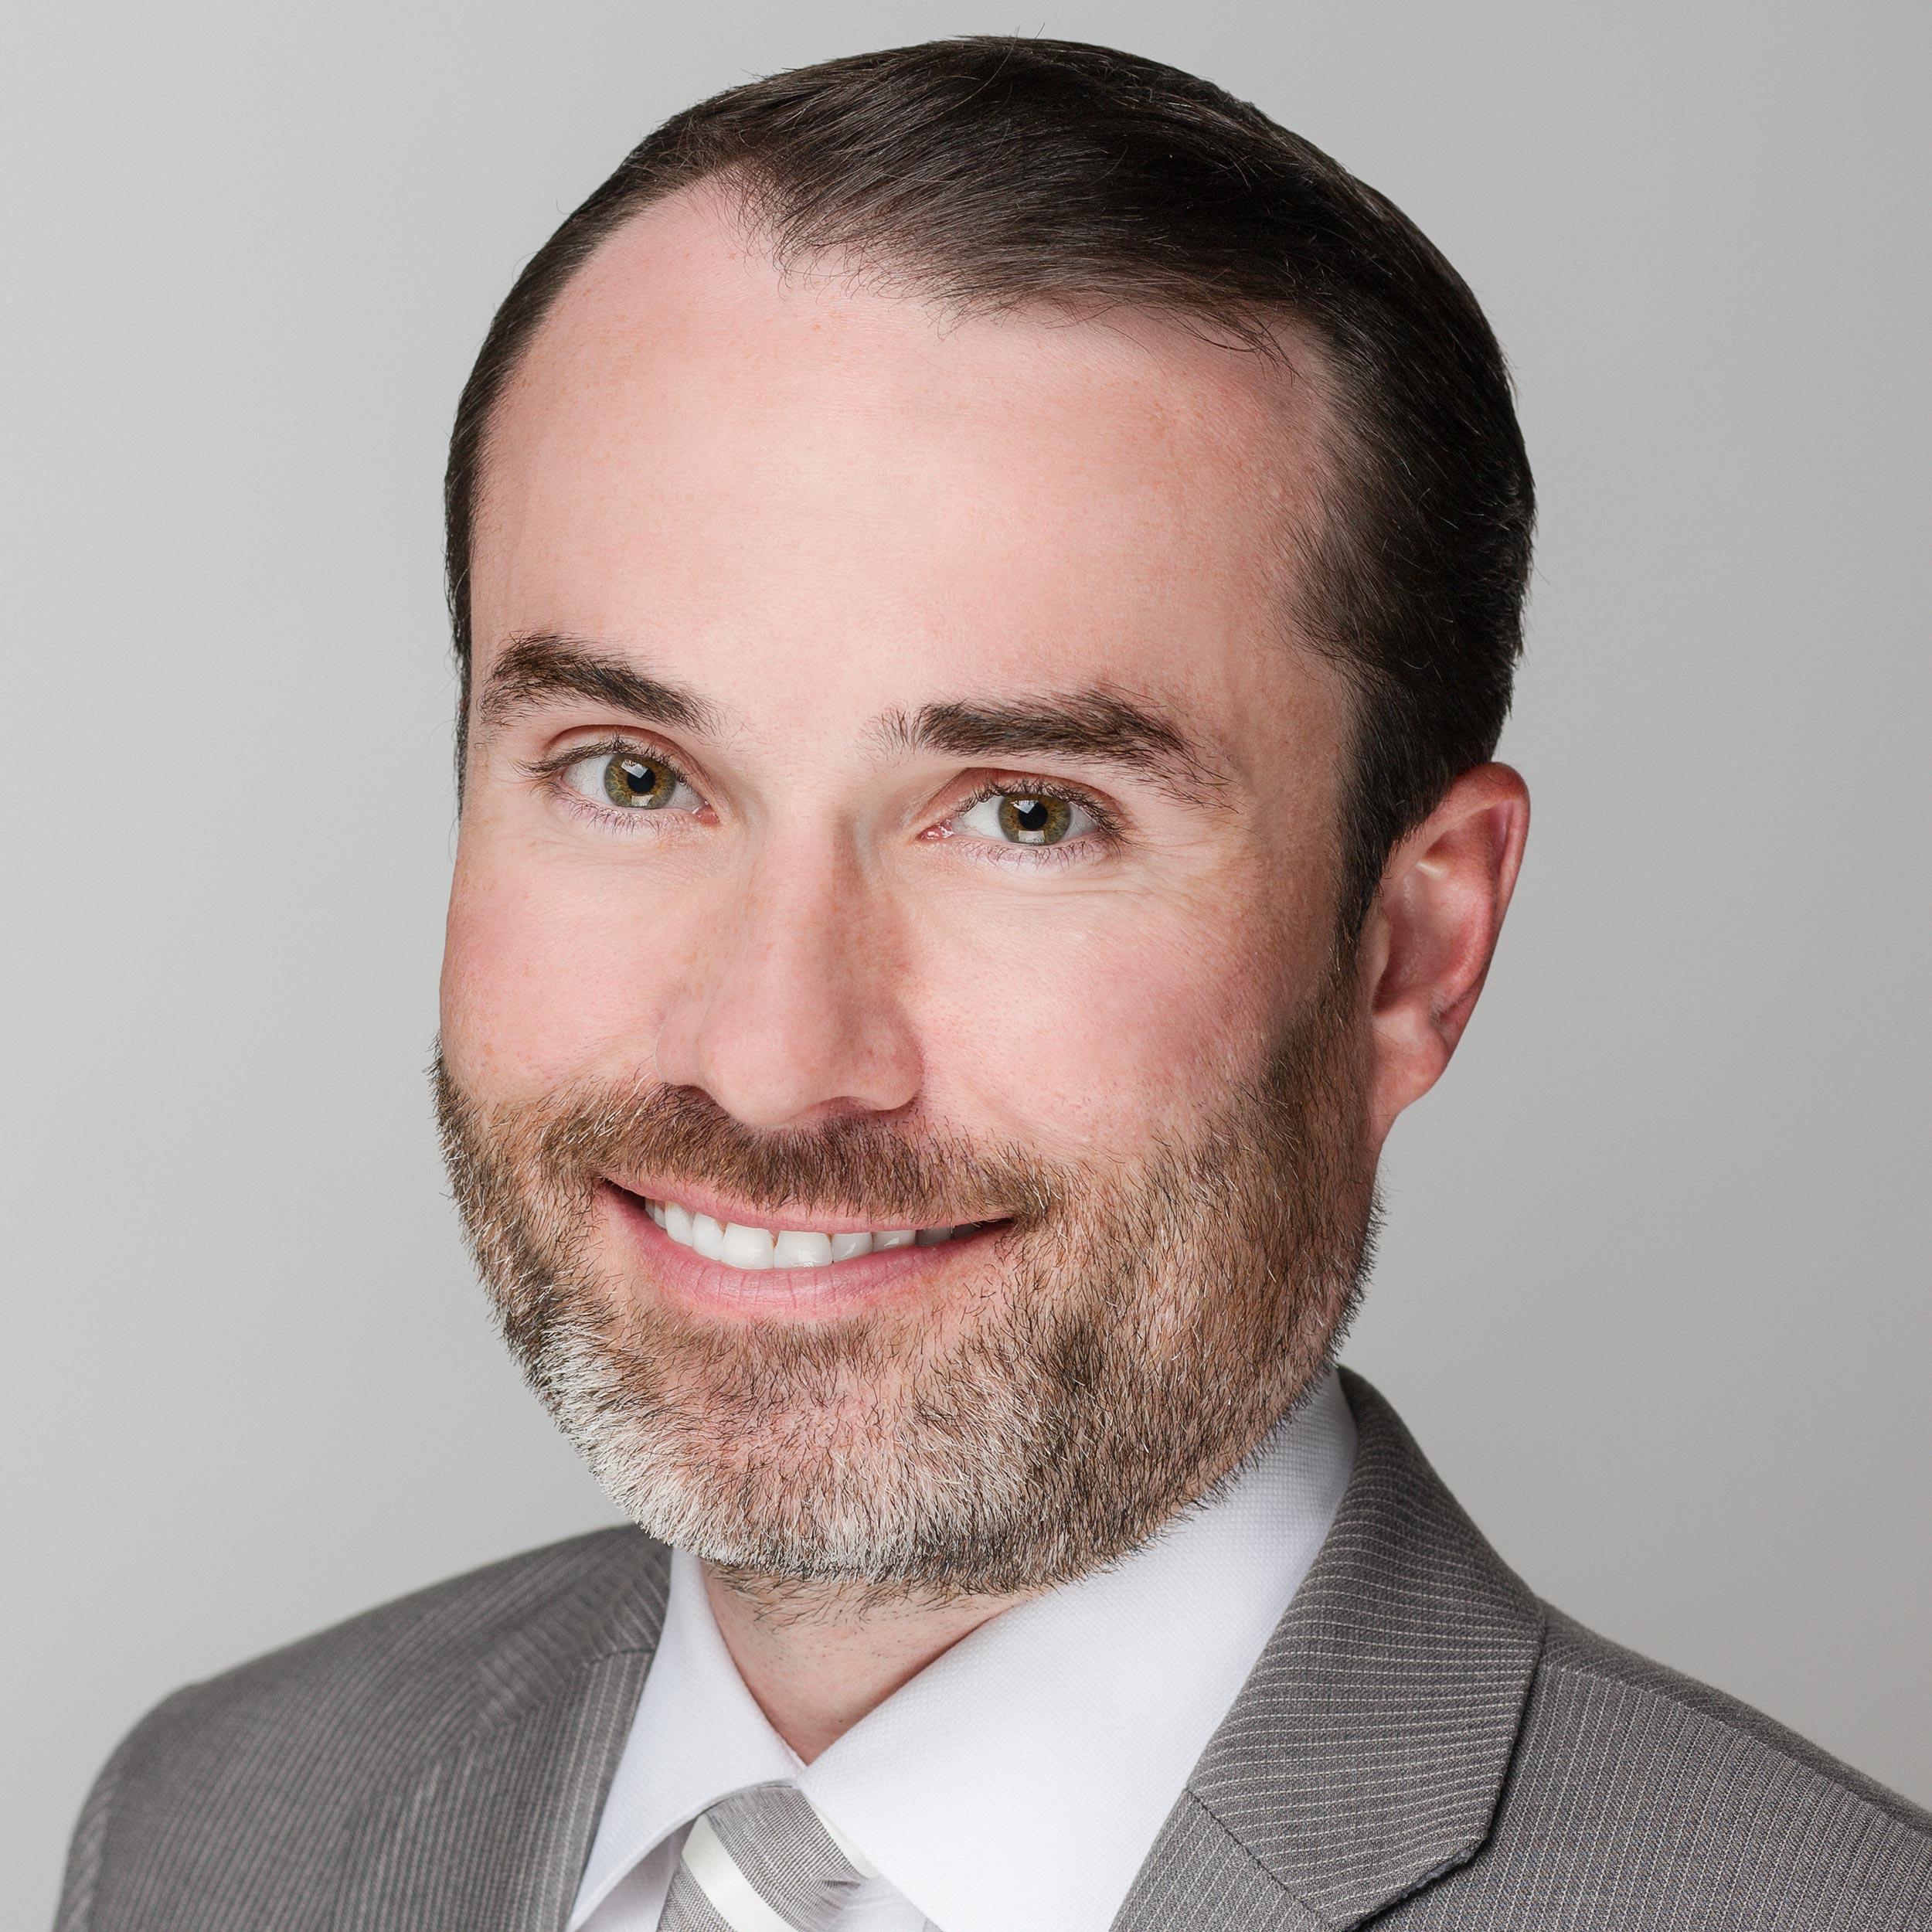 W. Kyle Simonton - Health Care Law